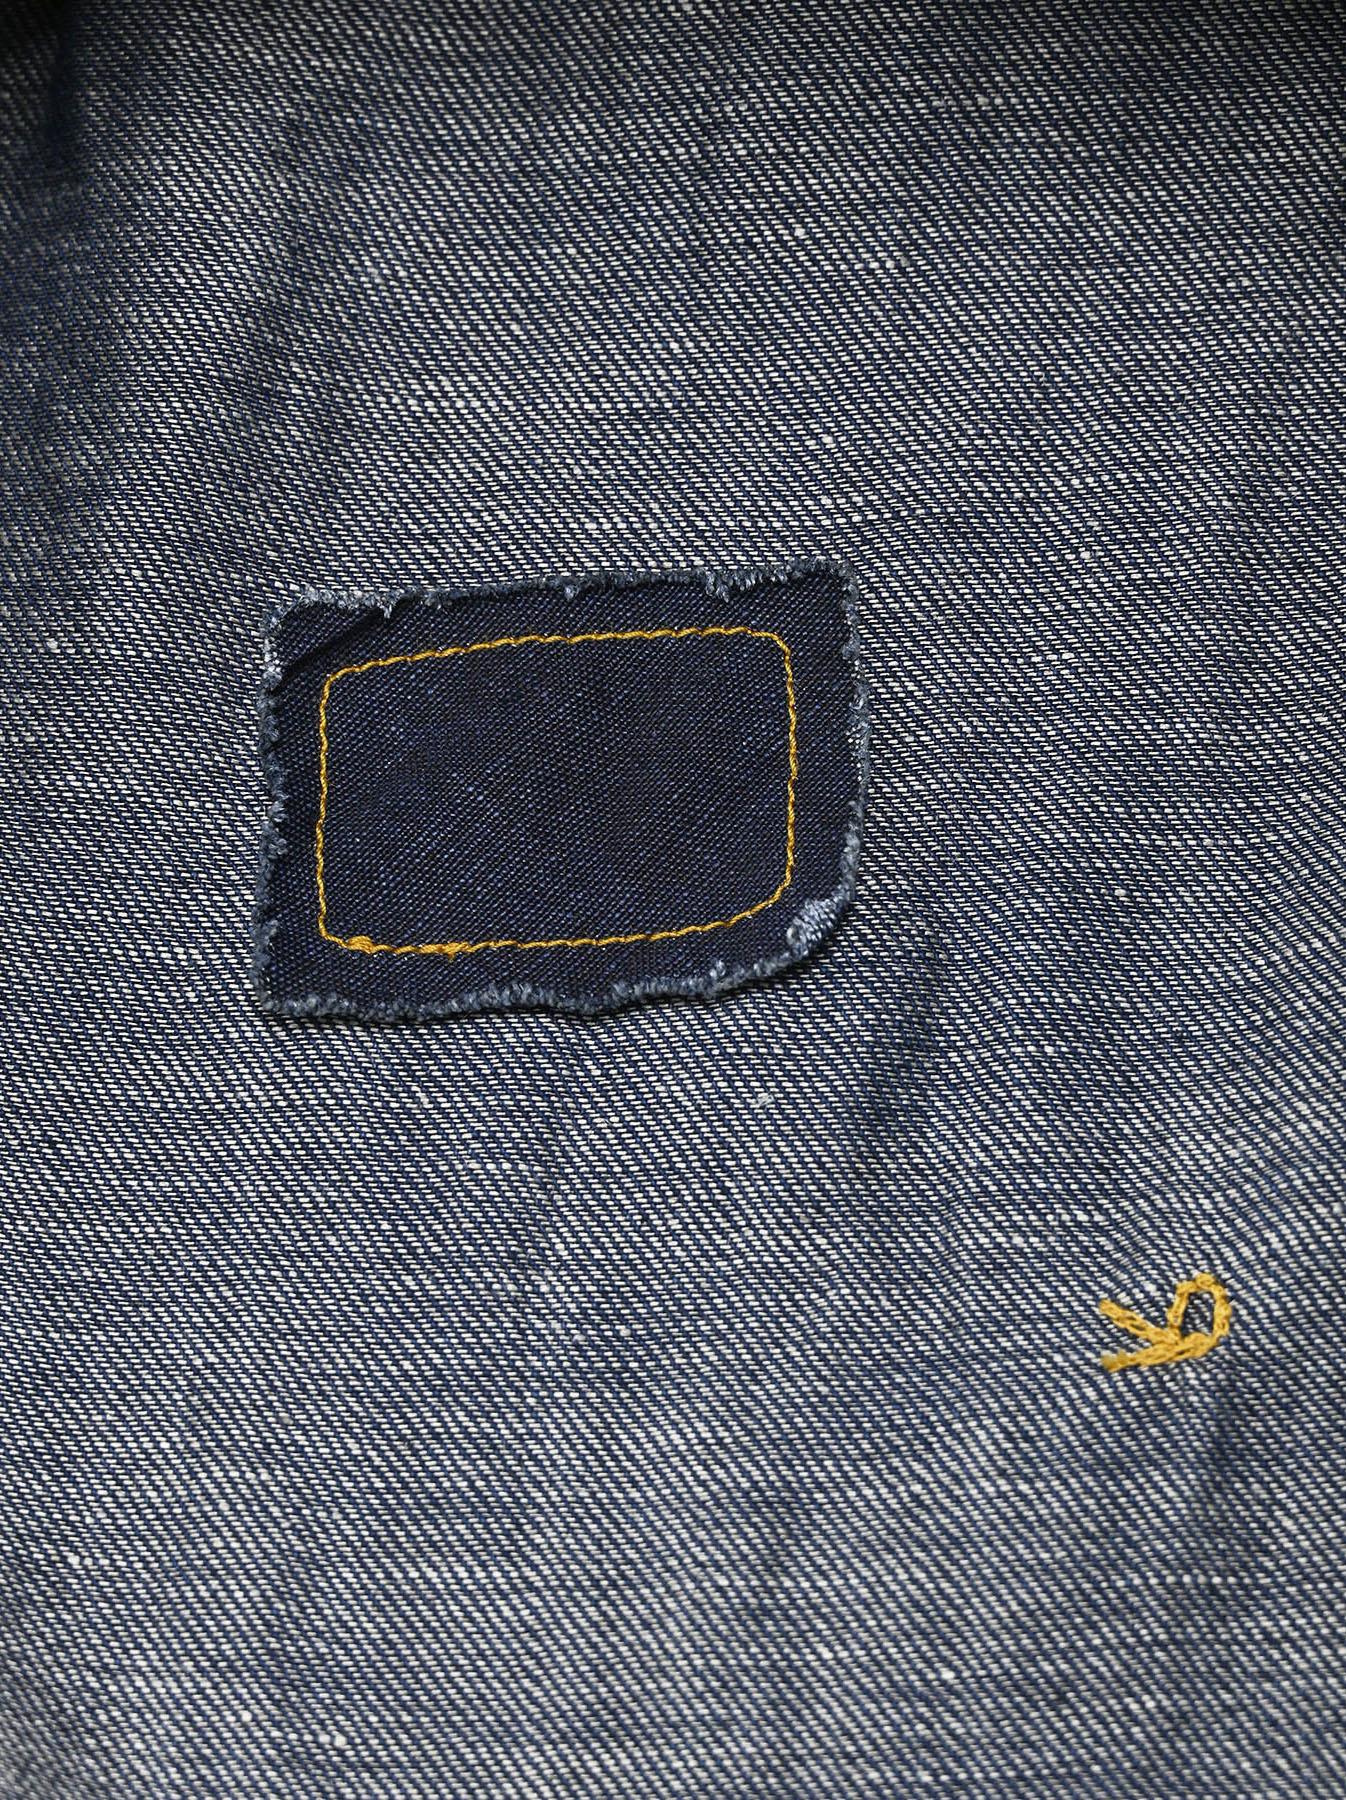 Komugi Denim Tuck Lace Dress-12